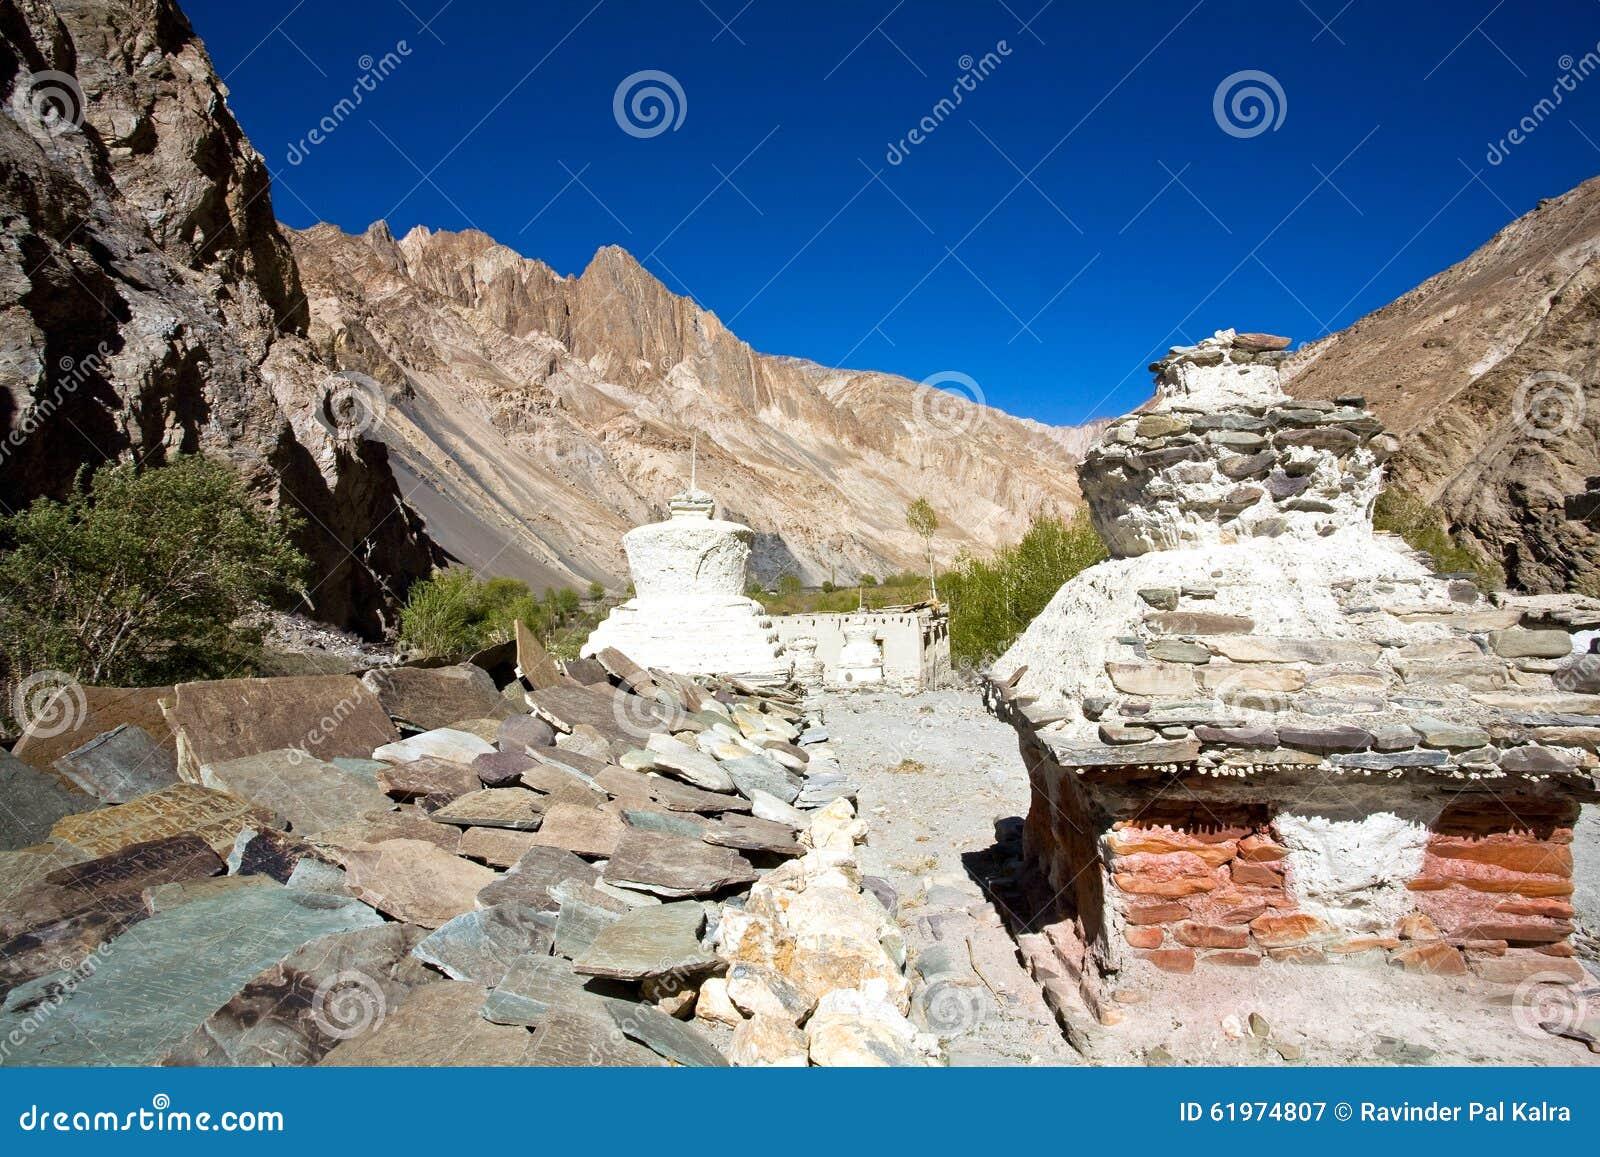 Chortens o Stupas durante el viaje de Markha, valle de Markha, Ladakh, la India